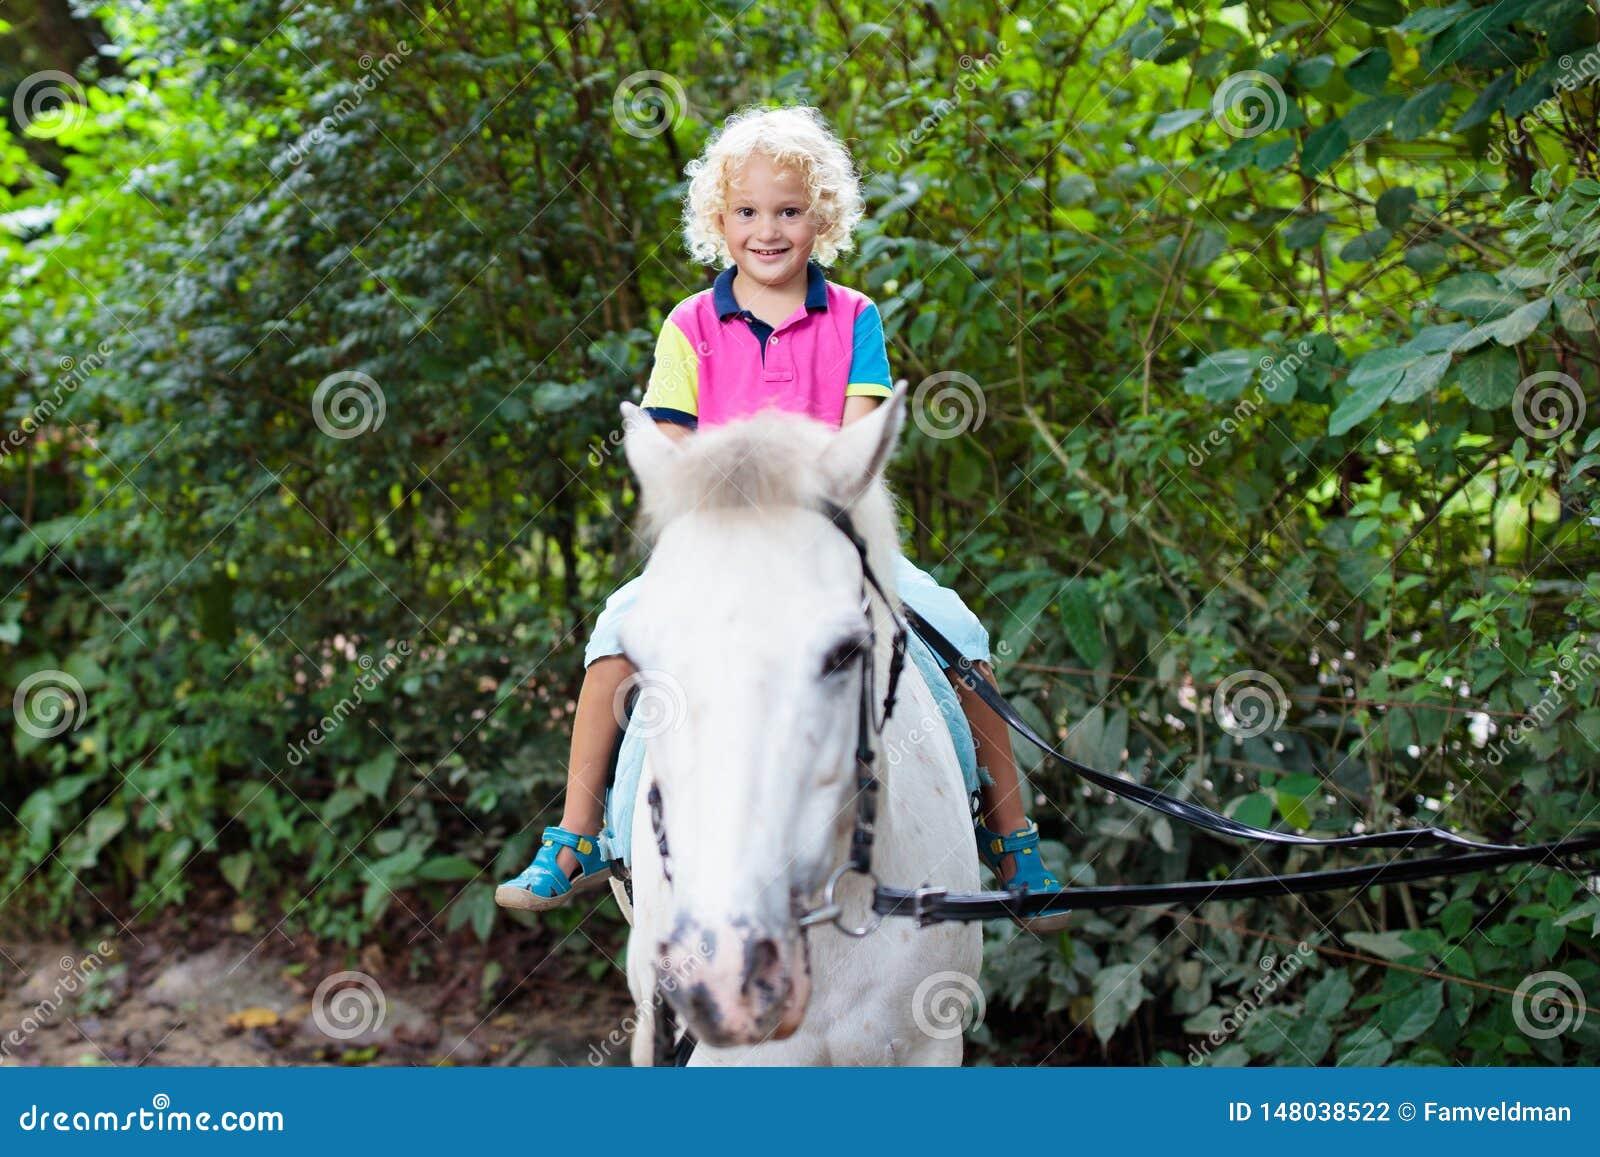 Child riding horse. Kids ride pony